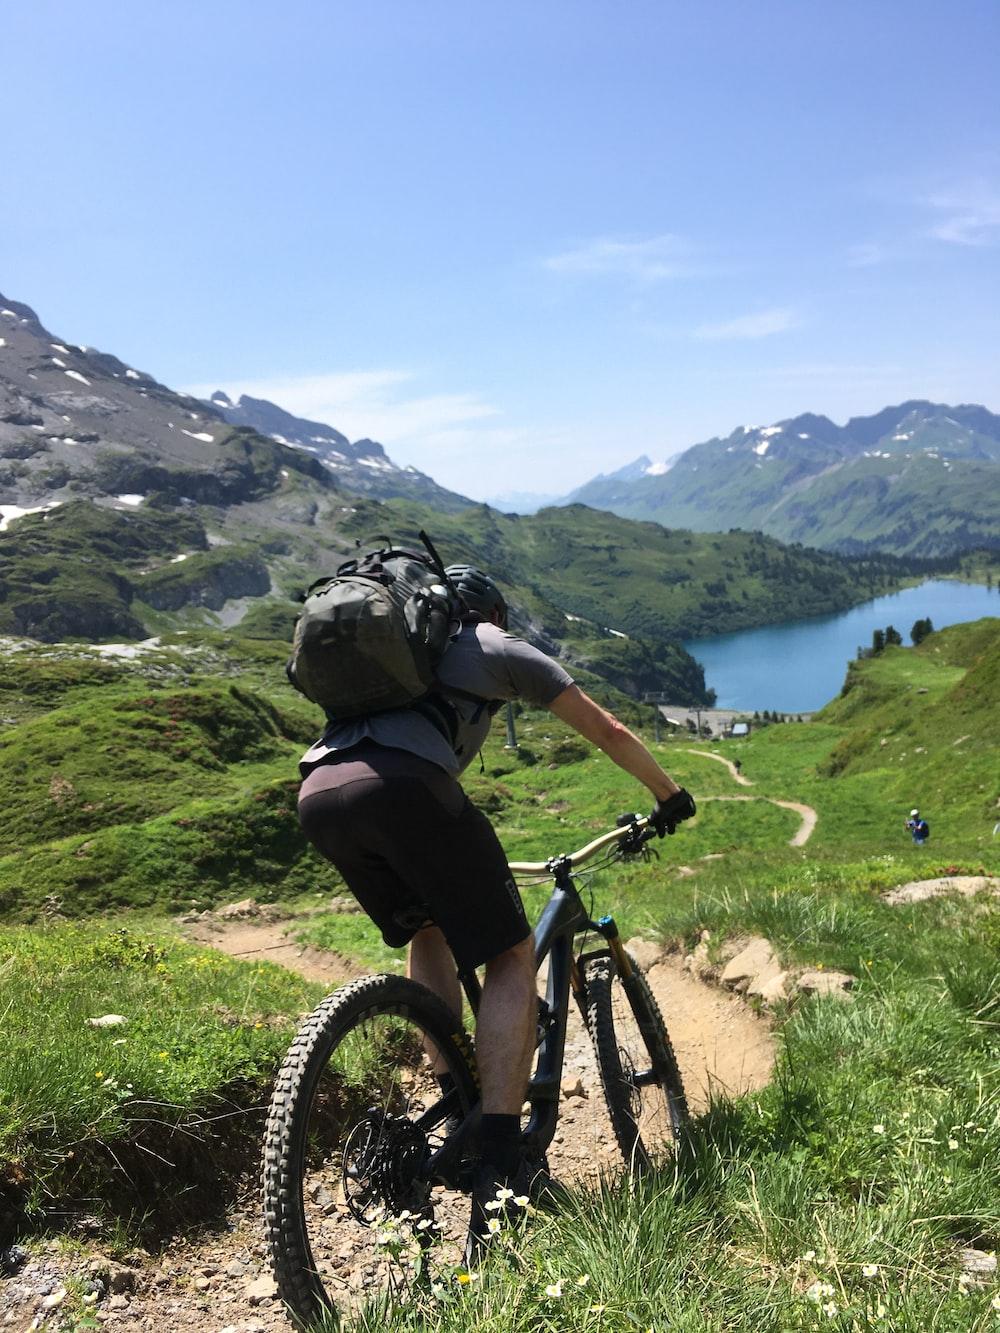 man in black t-shirt riding black mountain bike on green grass field during daytime